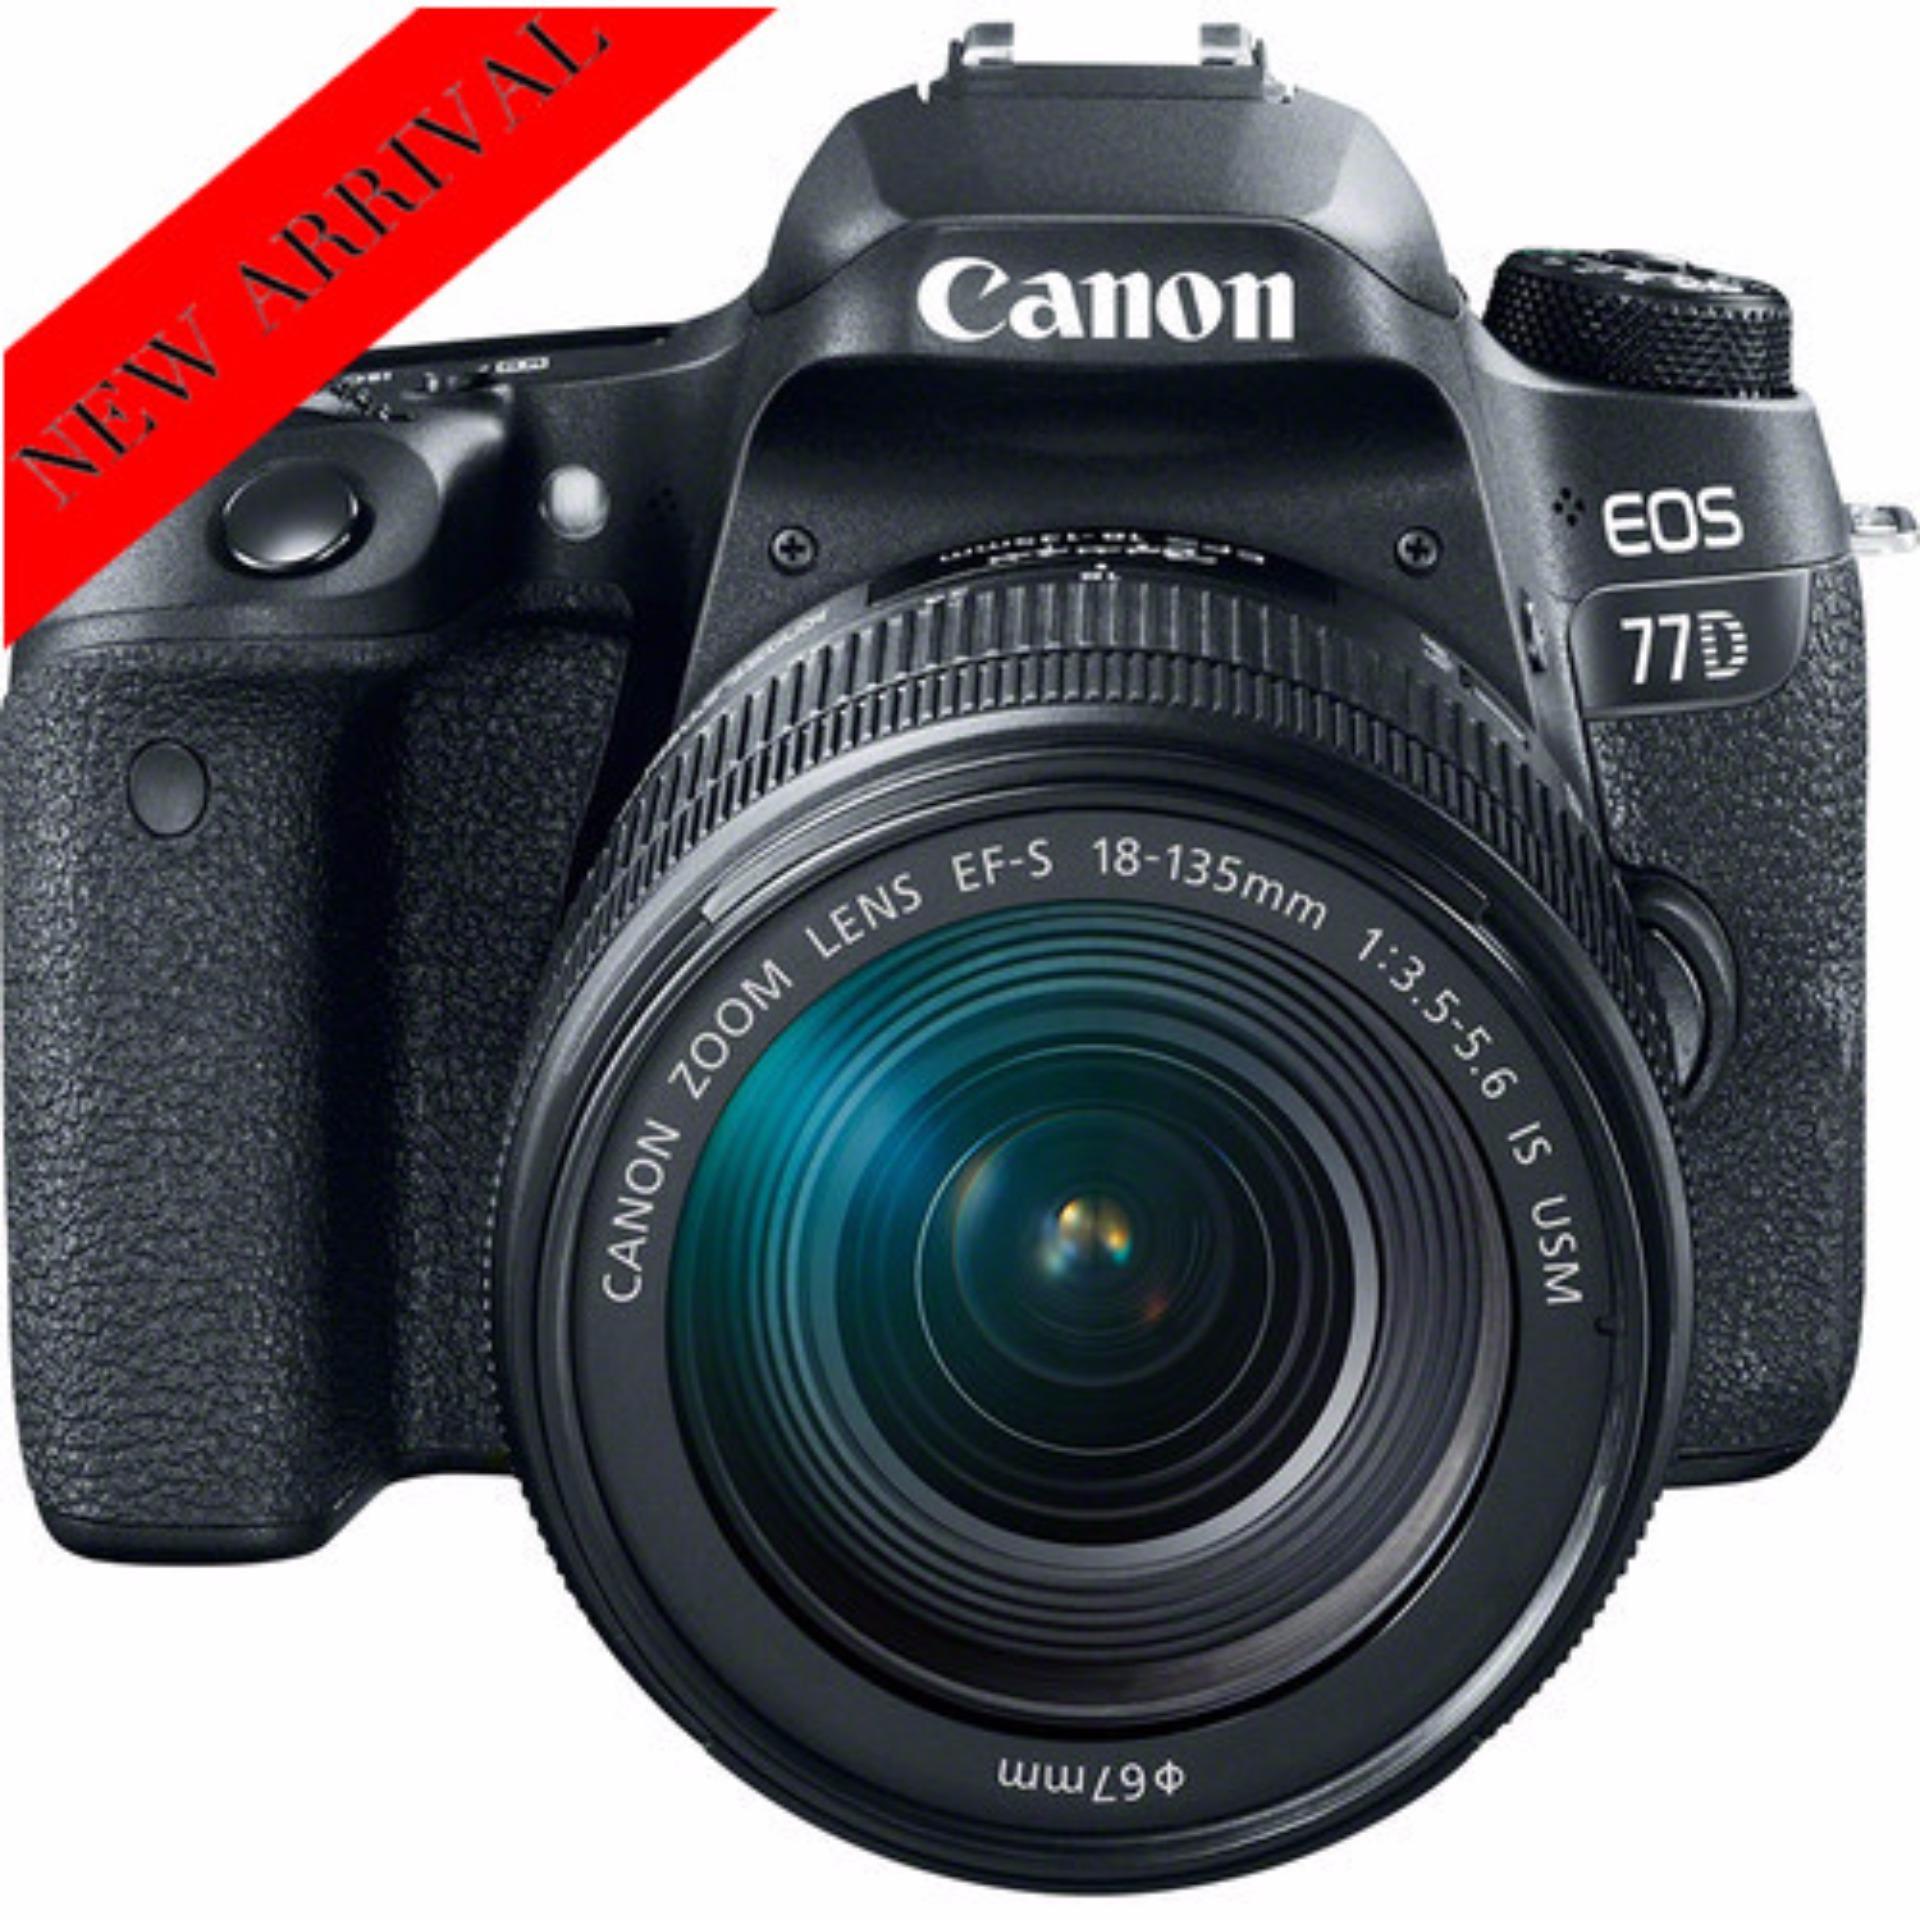 [NEW MODEL] Canon EOS 77D + EF-S 18-135mm IS USM Lens(Black)